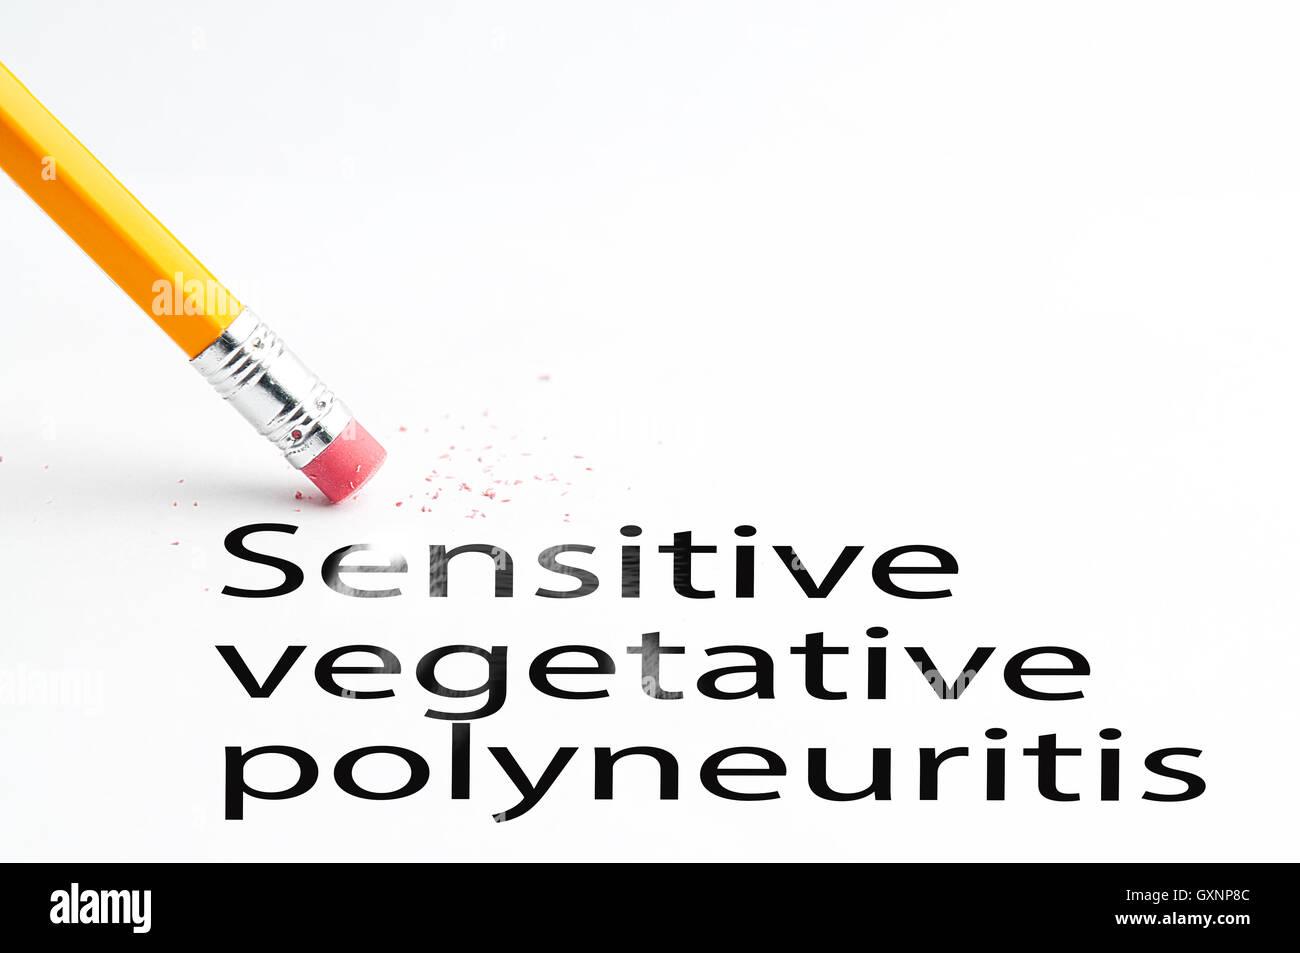 Pencil with eraser Sensitive vegetative polyneuritis - Stock Image